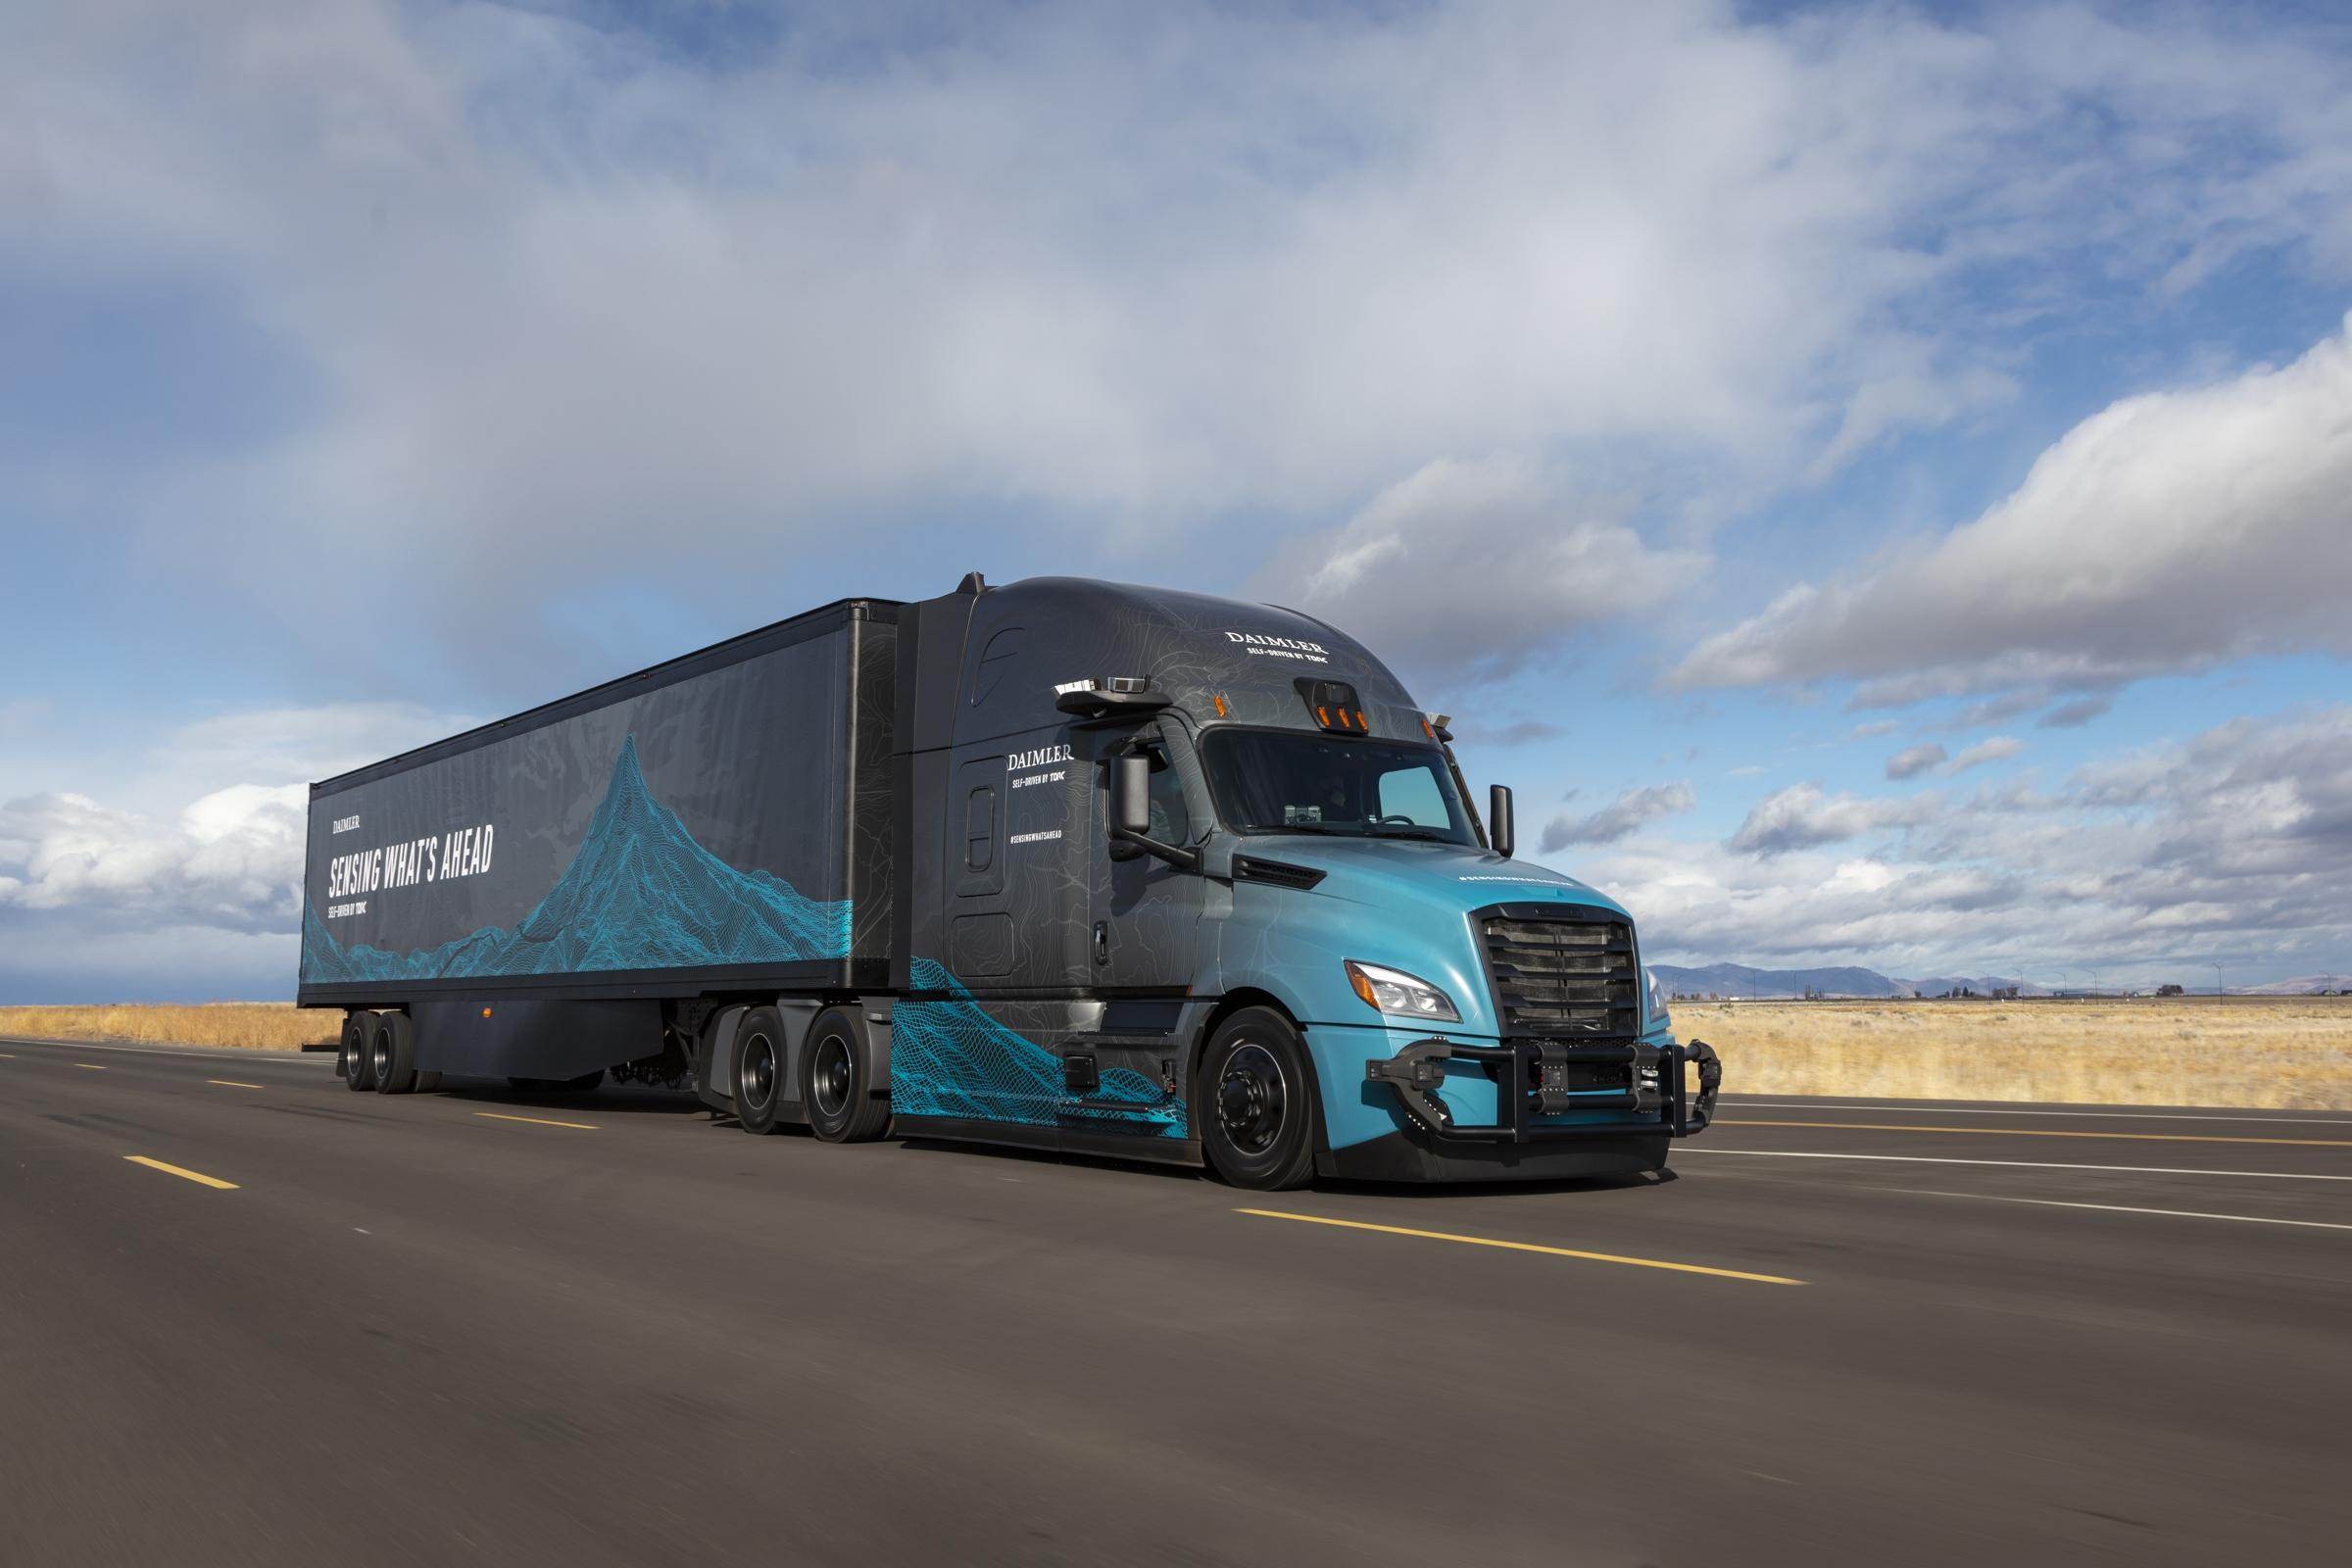 Torc Robotics Amazon camion guida autonoma